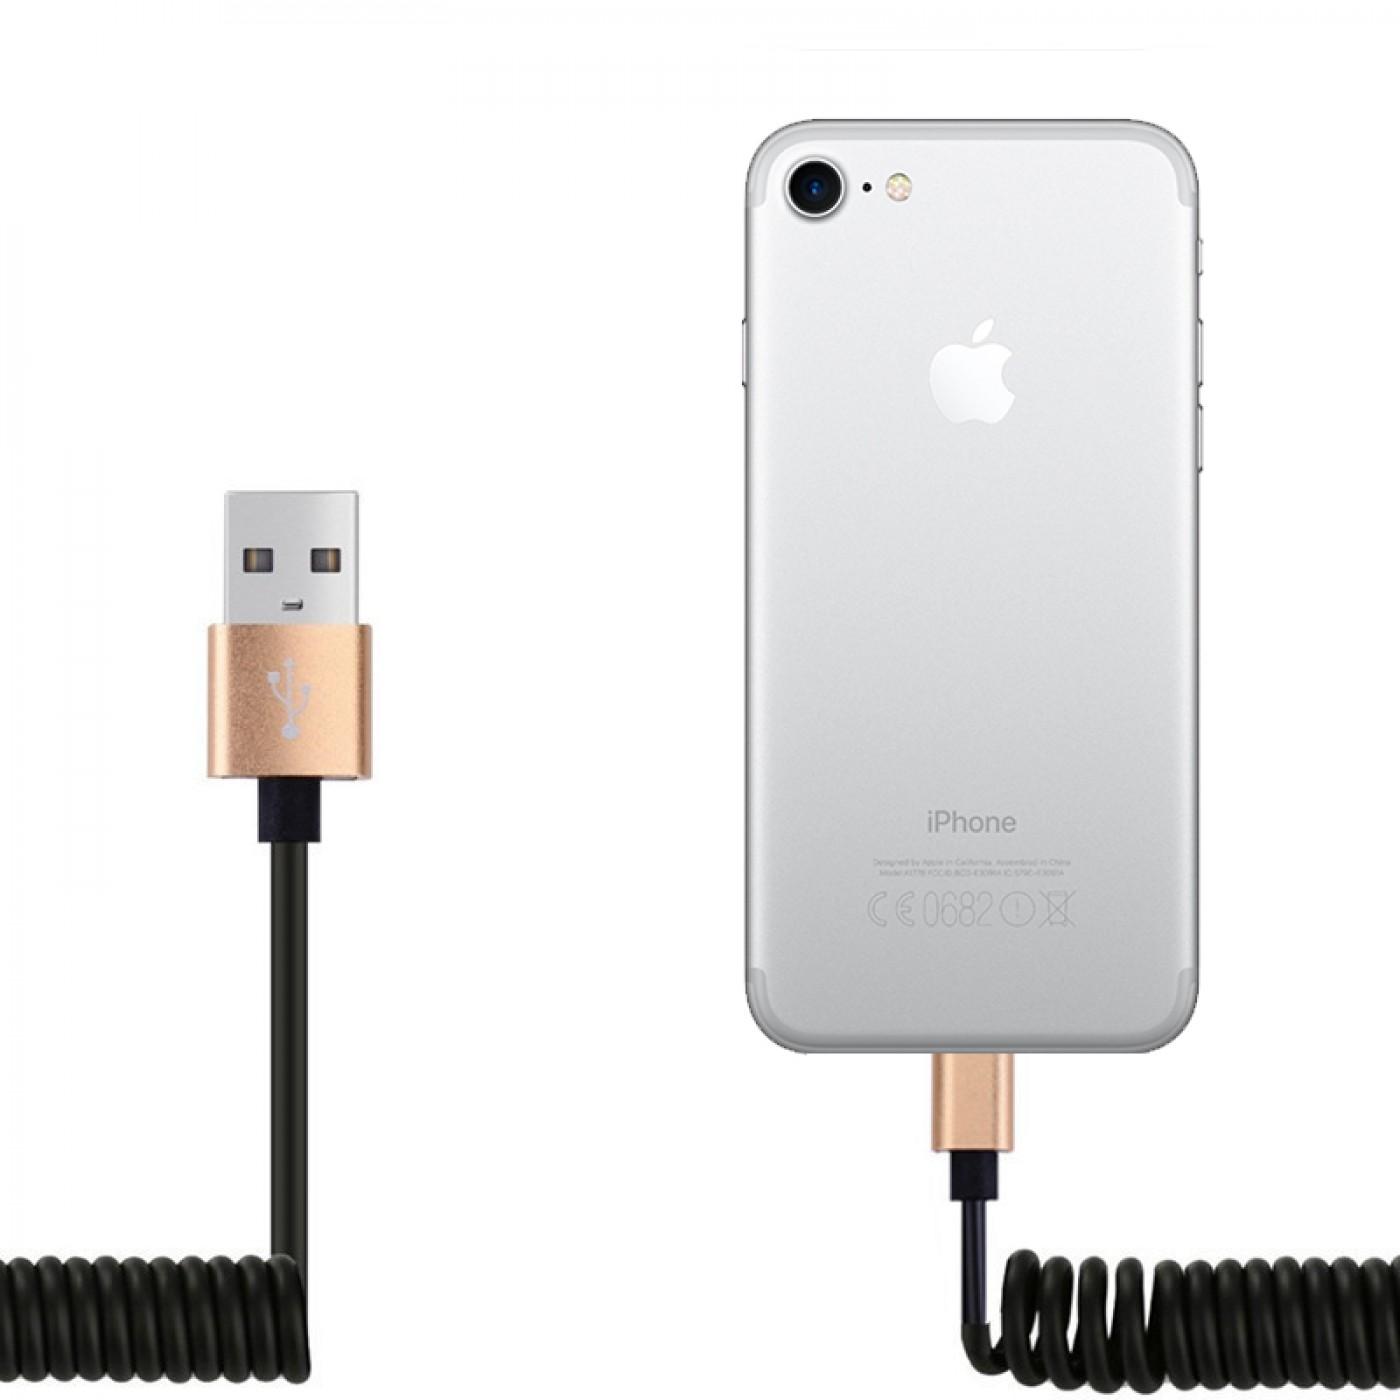 lightning kabel ausziehbar iphone. Black Bedroom Furniture Sets. Home Design Ideas